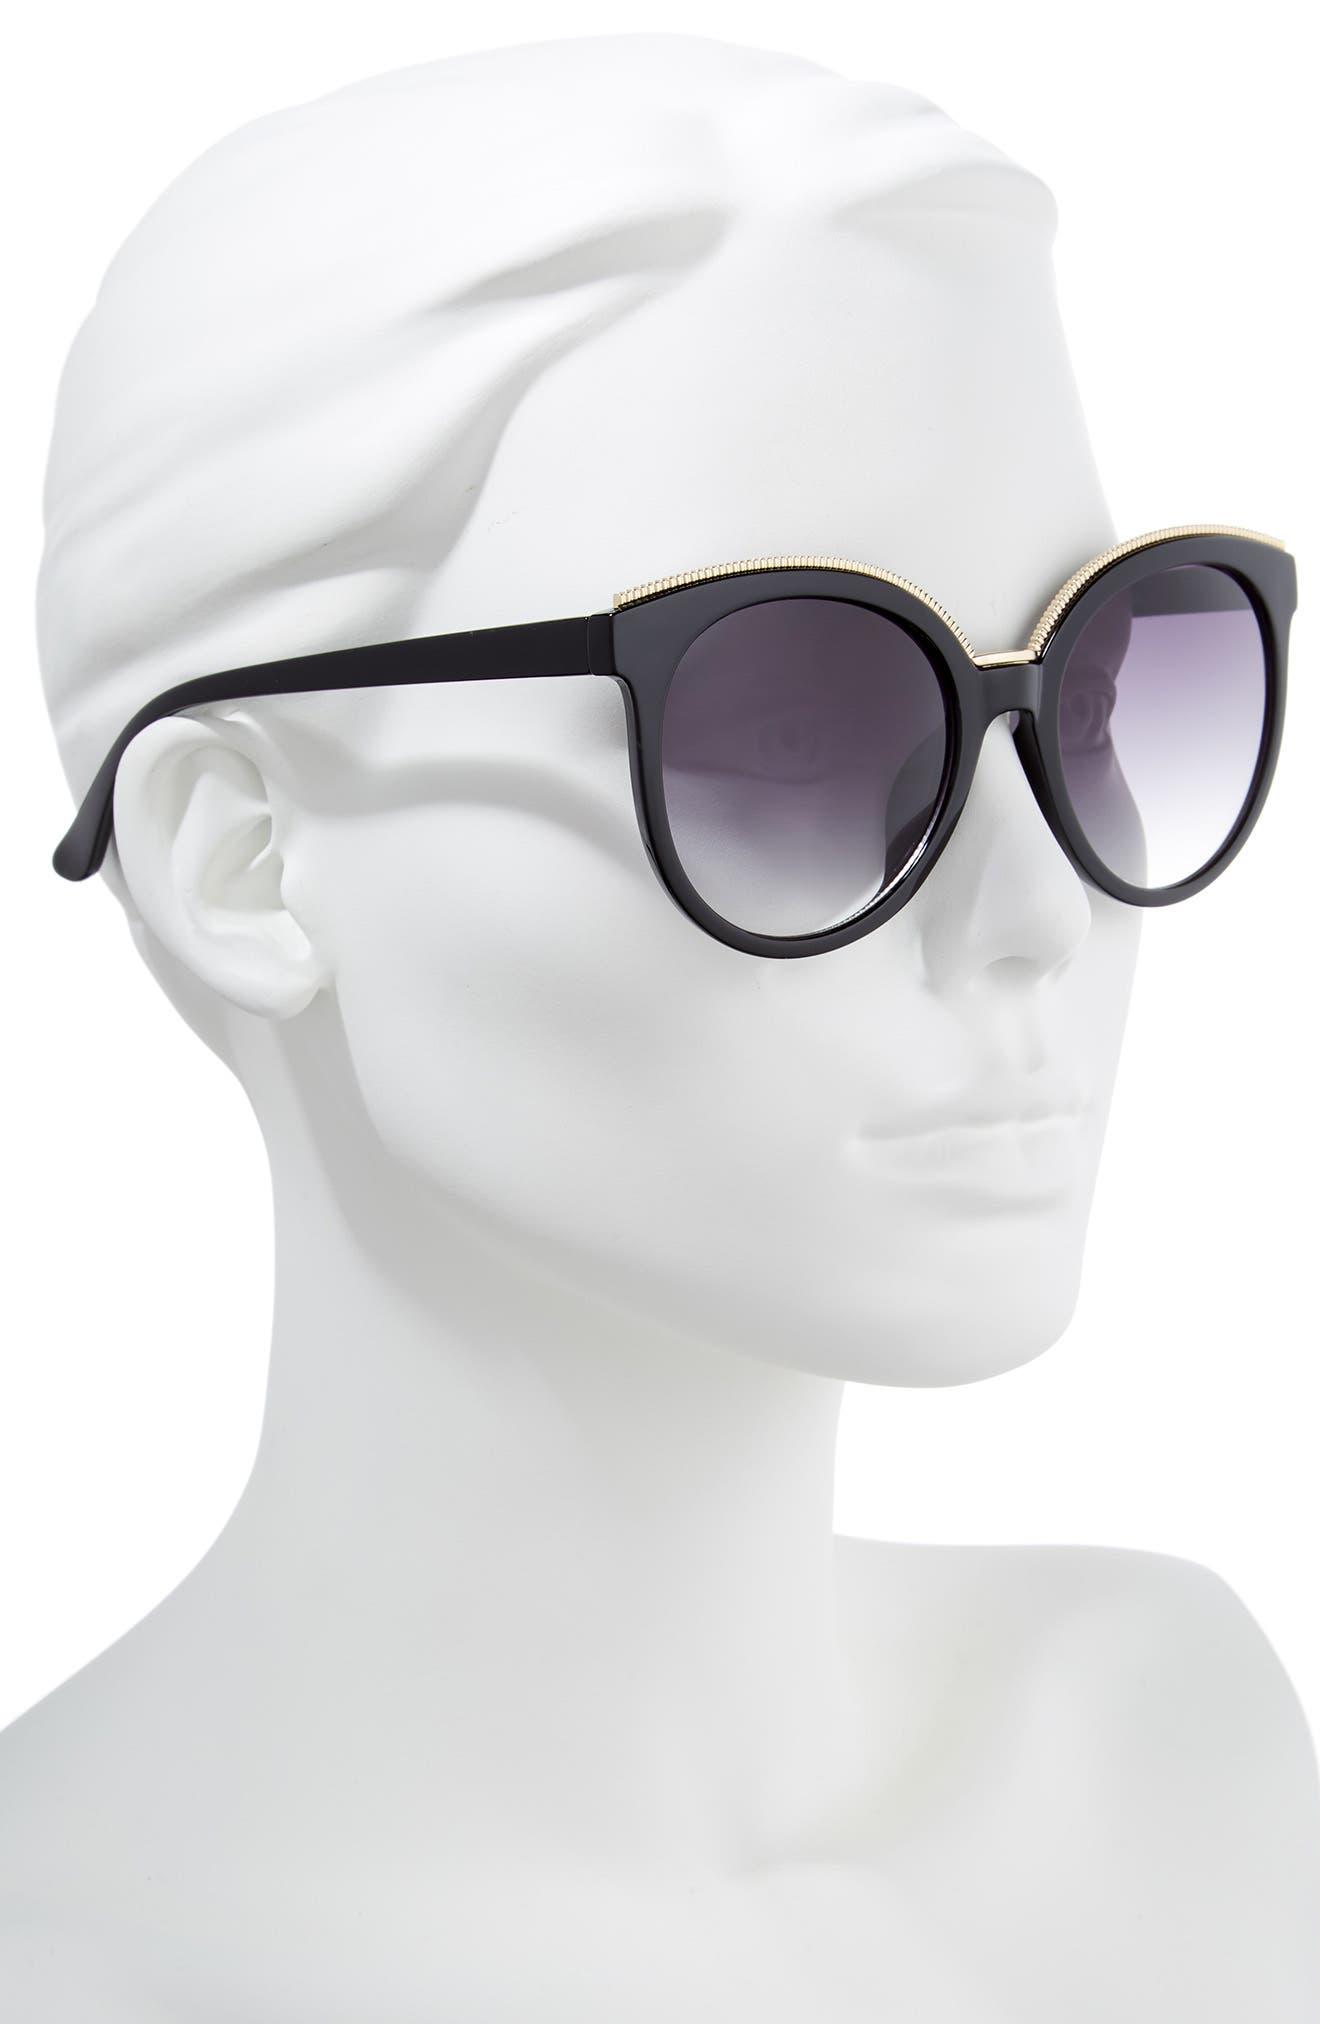 56mm Metal Trim Round Sunglasses,                             Alternate thumbnail 2, color,                             001